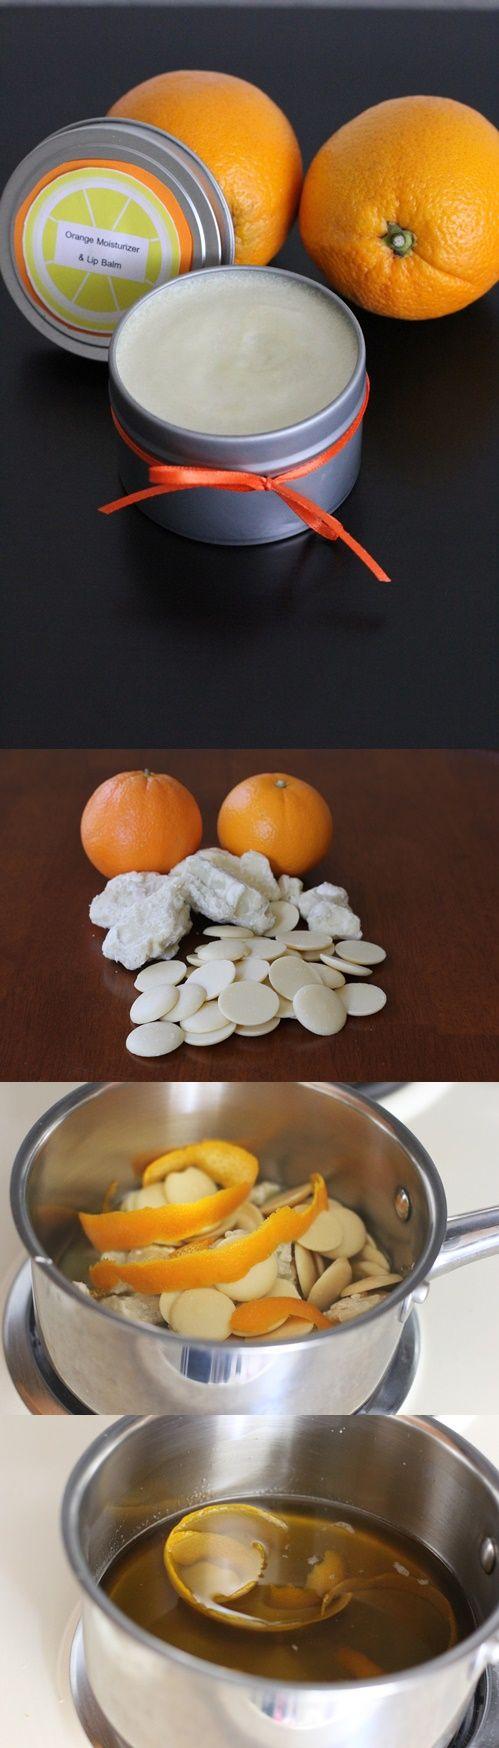 DIY Orange Scented Hand Moisturizer and Lip Balm